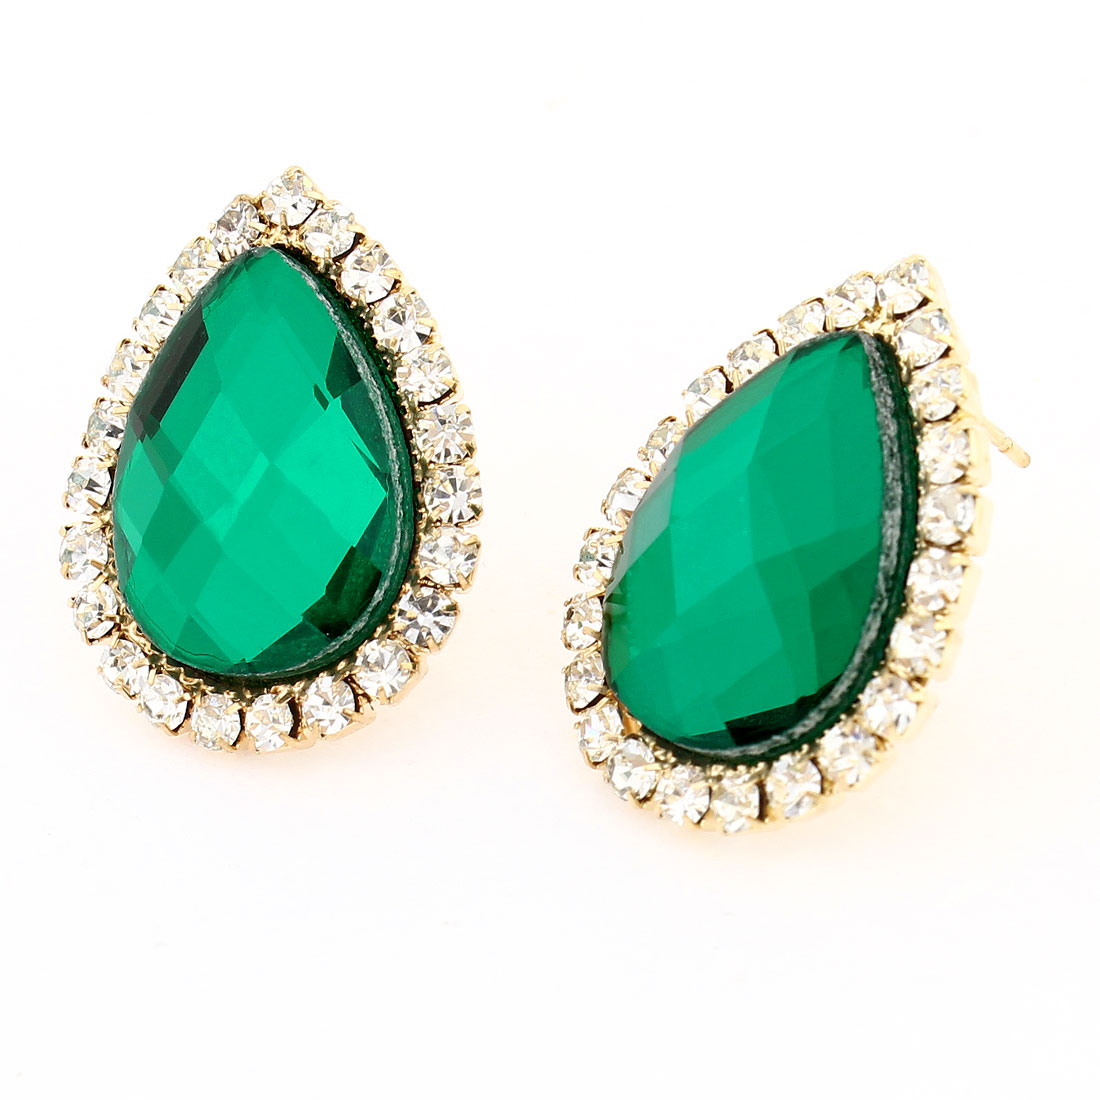 Green Faux Rhinestone Decor Waterdrop Shaped French Clip Stud Earrings x 2